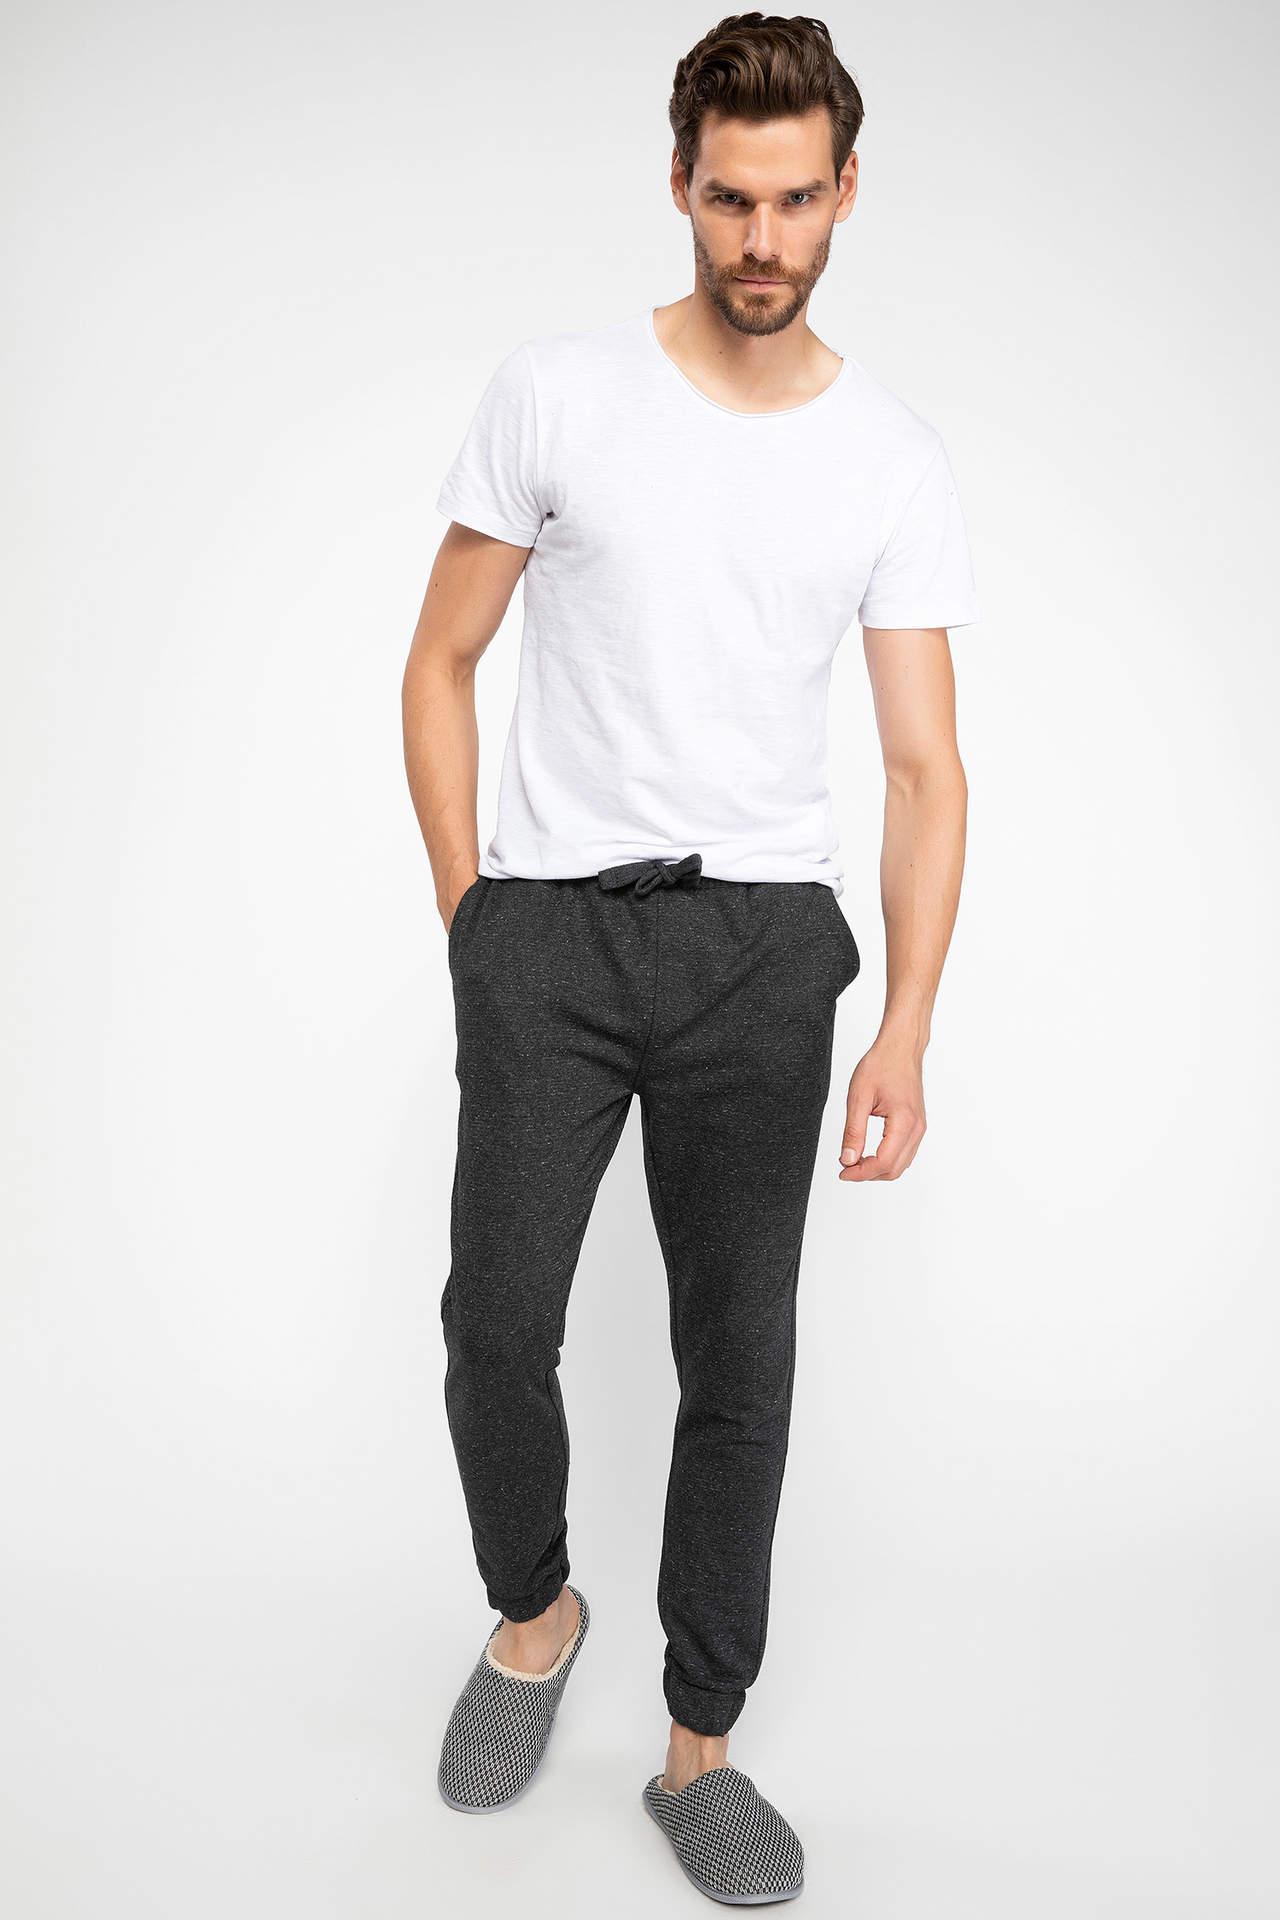 DeFacto Erkek Elastik Bel Pantolon Gri male